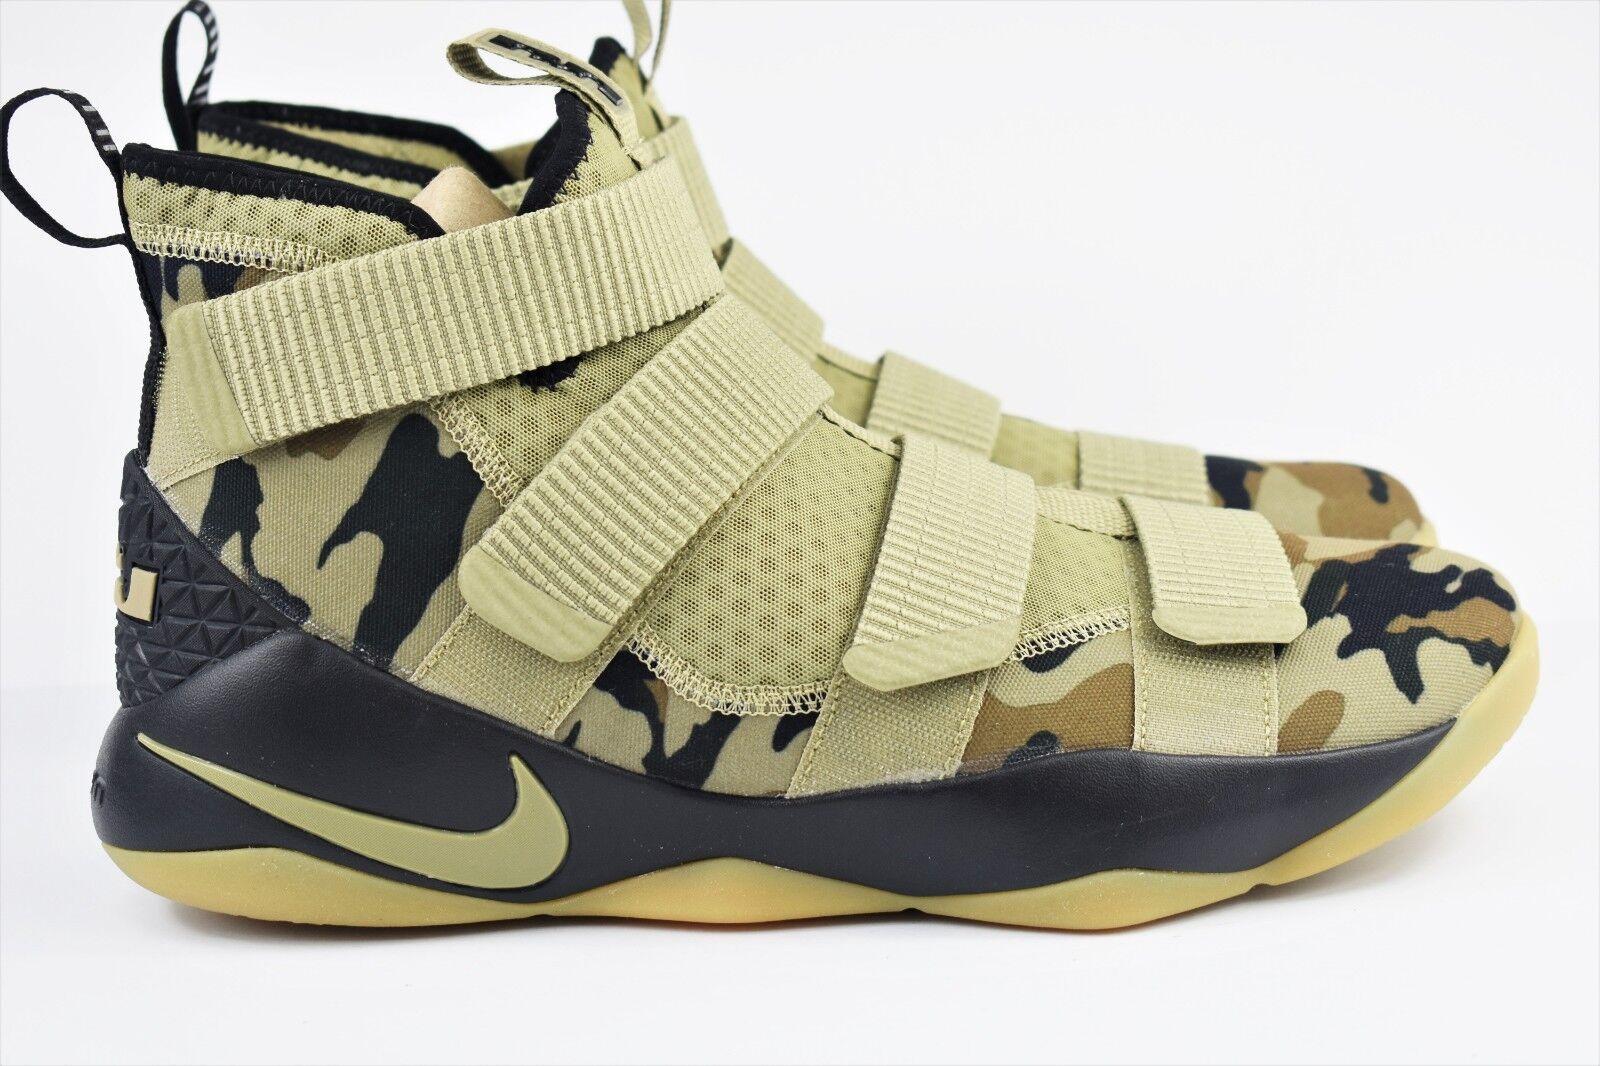 nike lebron soldat 11 xi de basket - ball taille de camouflage 897644 de taille ball 10 200 7dbf68